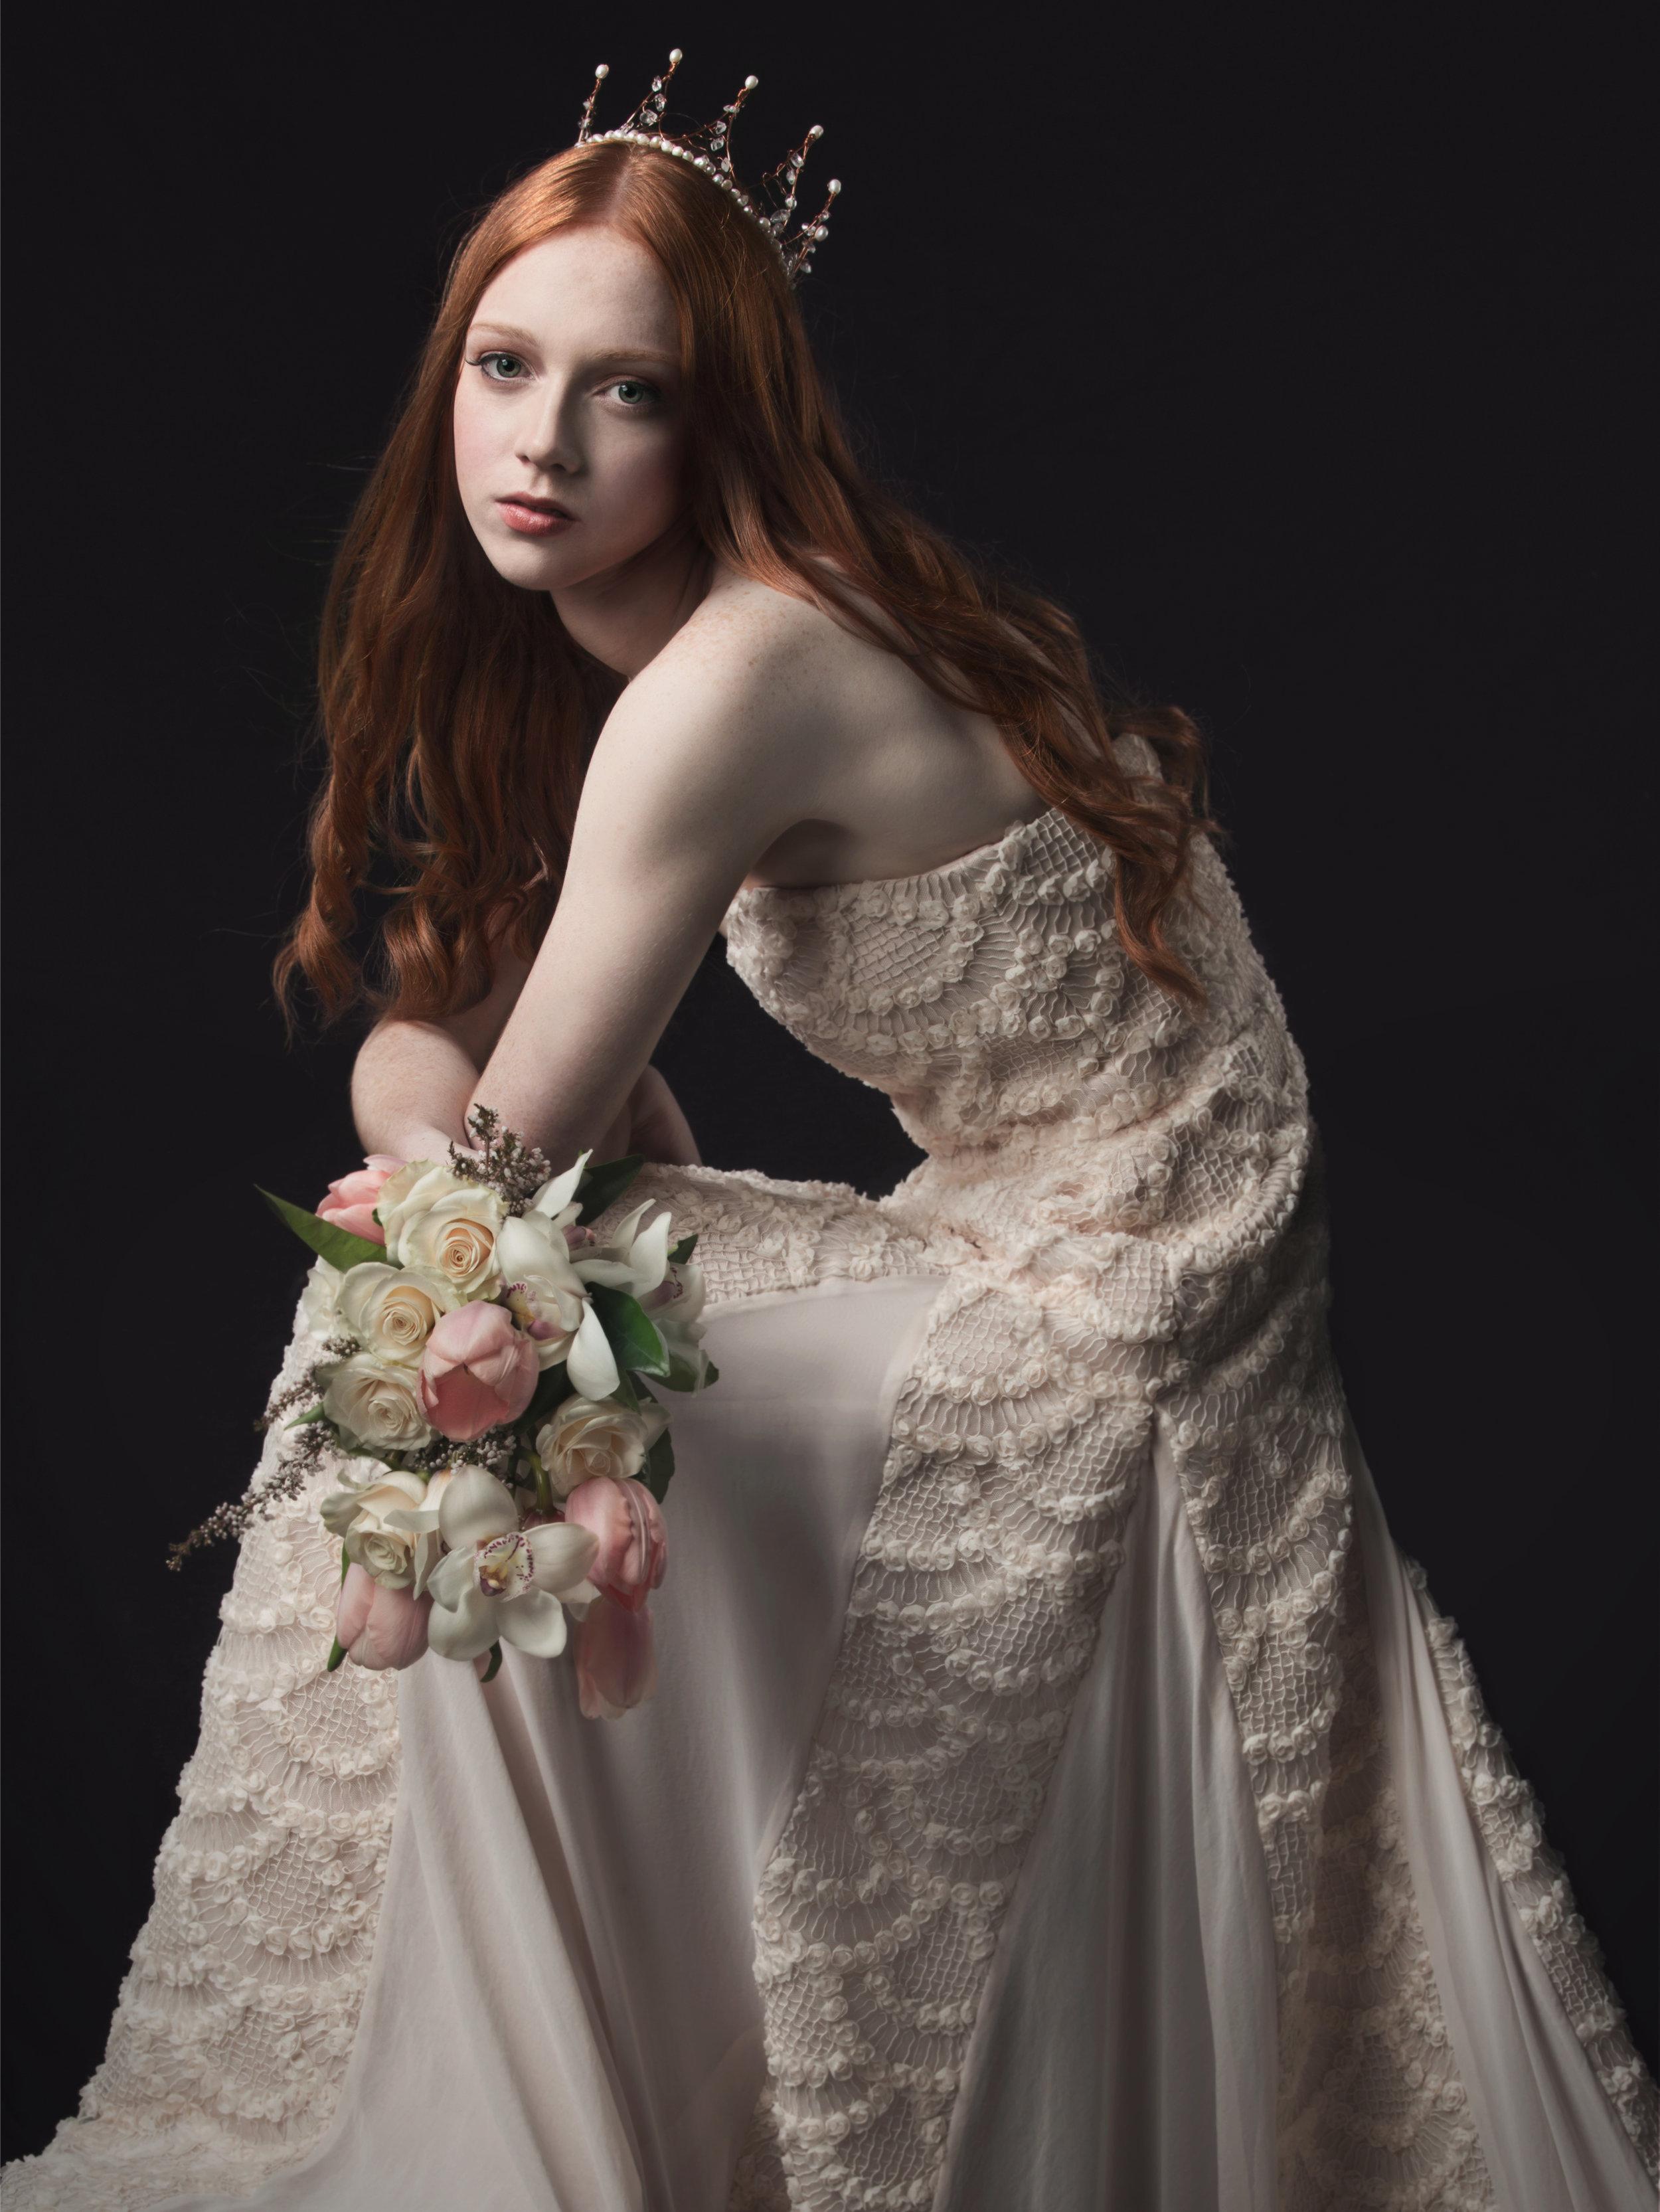 Fieulaine-Fine-Art-Bridal_Katy01-1.jpg